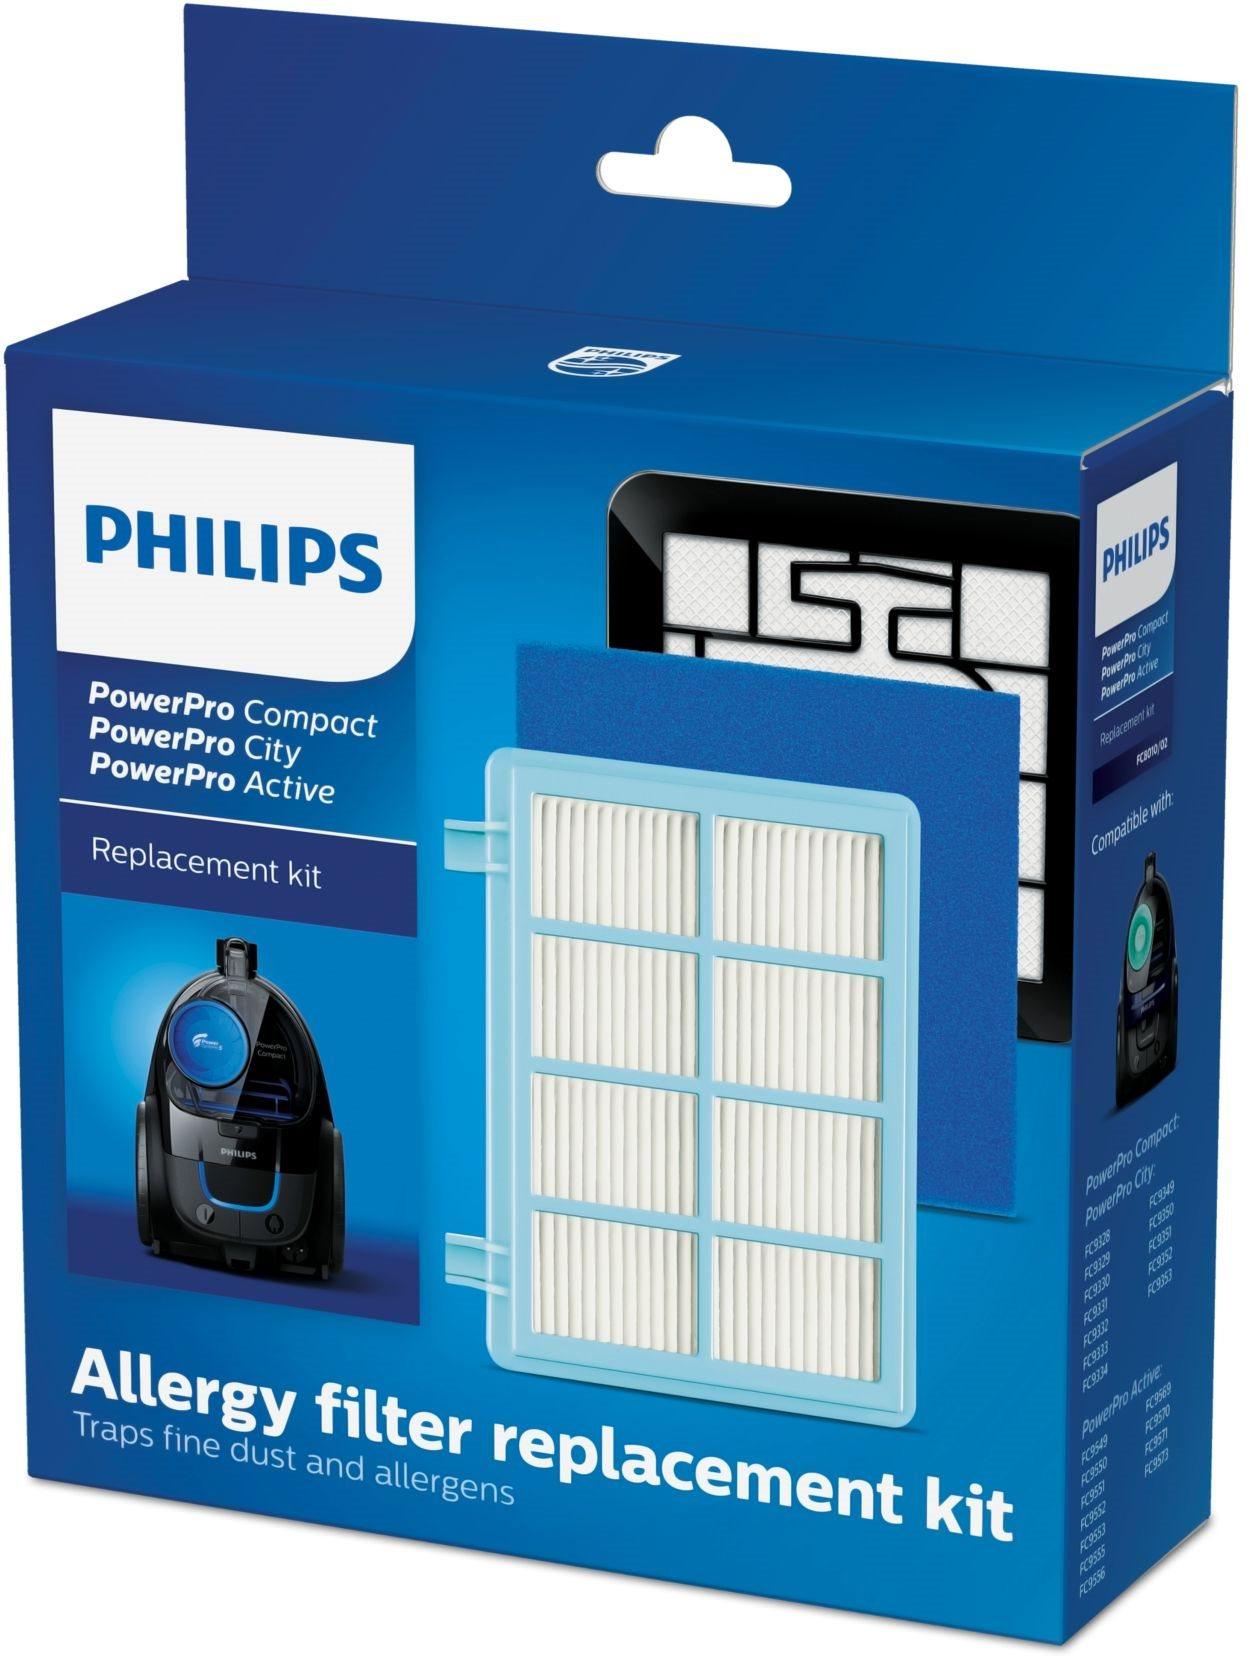 Philips Σετ Ανταλλακτικά Αντιαλλεργικών Φίλτρων 3τμχ για Σκούπες Powerpro Active FC8010/02